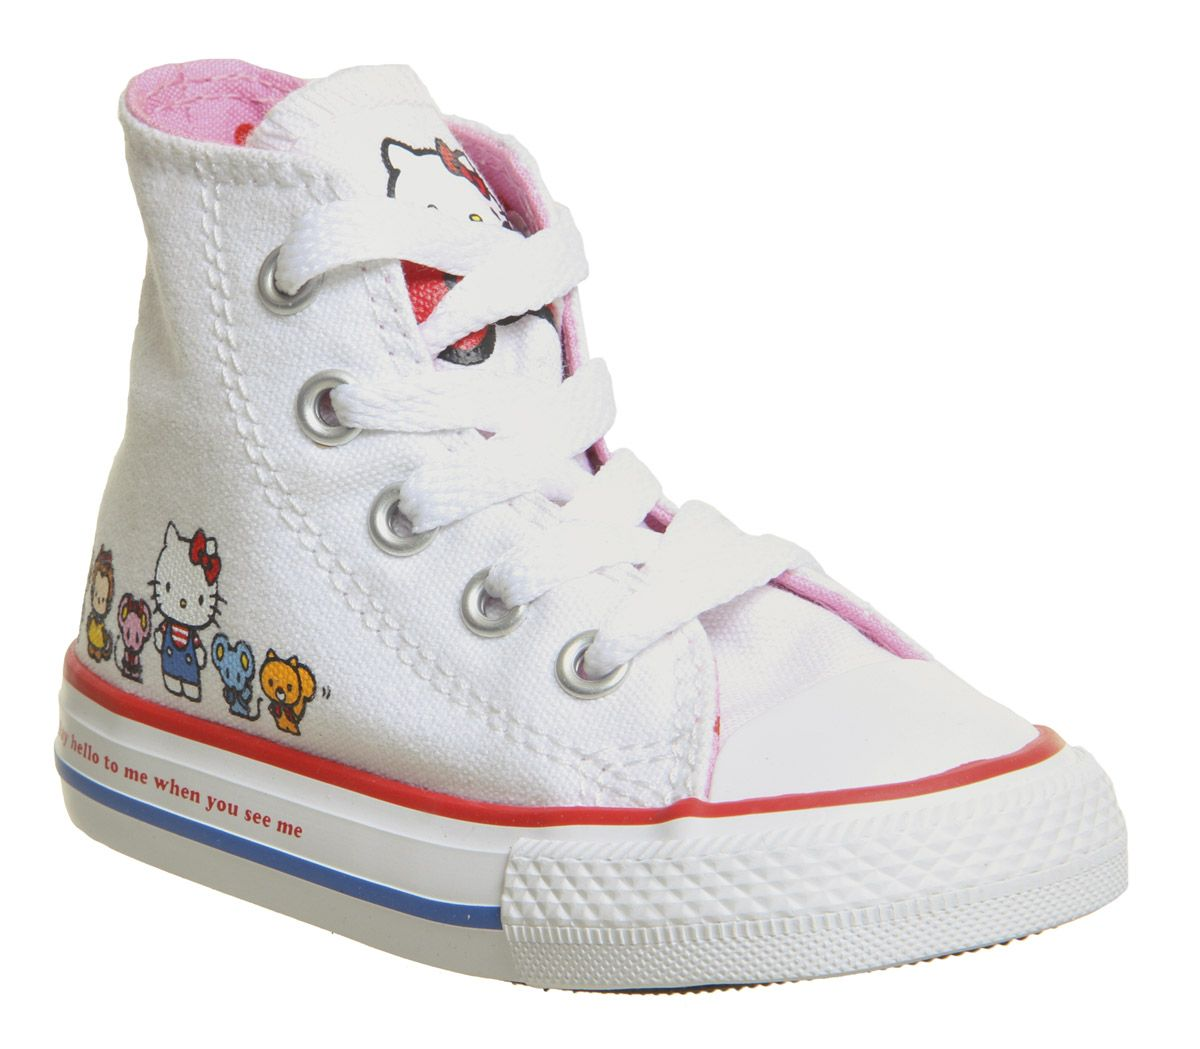 17b01ec38010 Converse Small Star Hi Canvas Trainers White Hello Kitty - Unisex